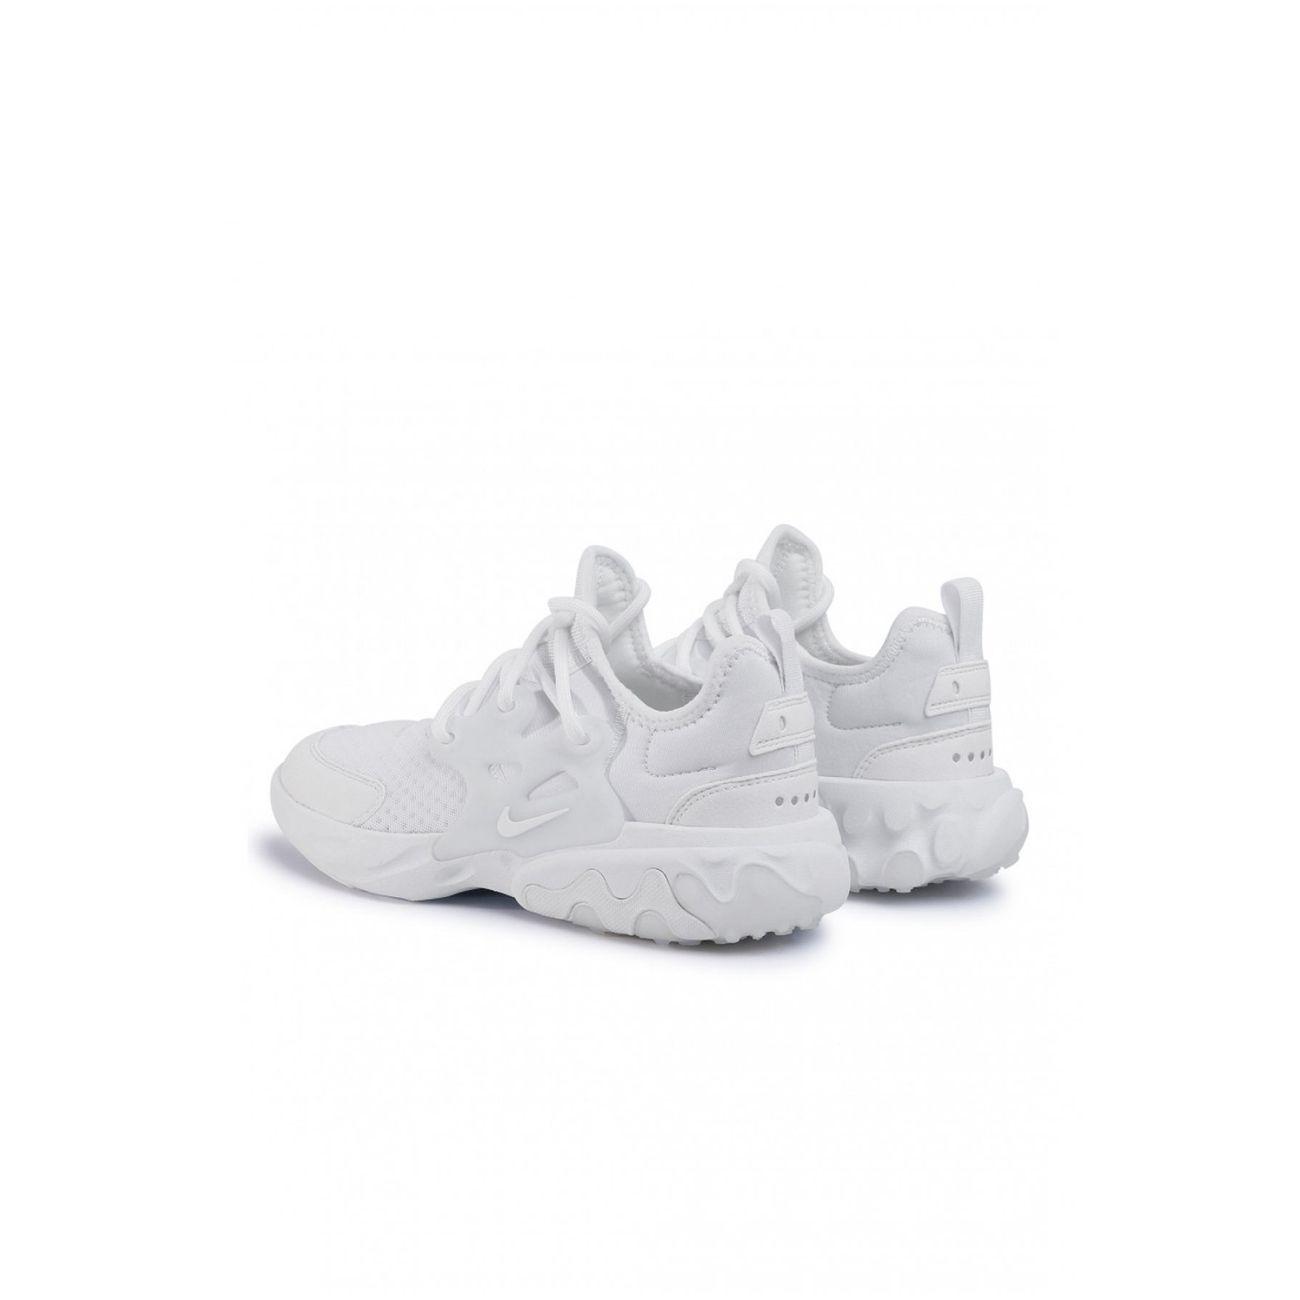 enfant NIKE Baskets chaussons REACT PRESTO GS - Nike - Enfant